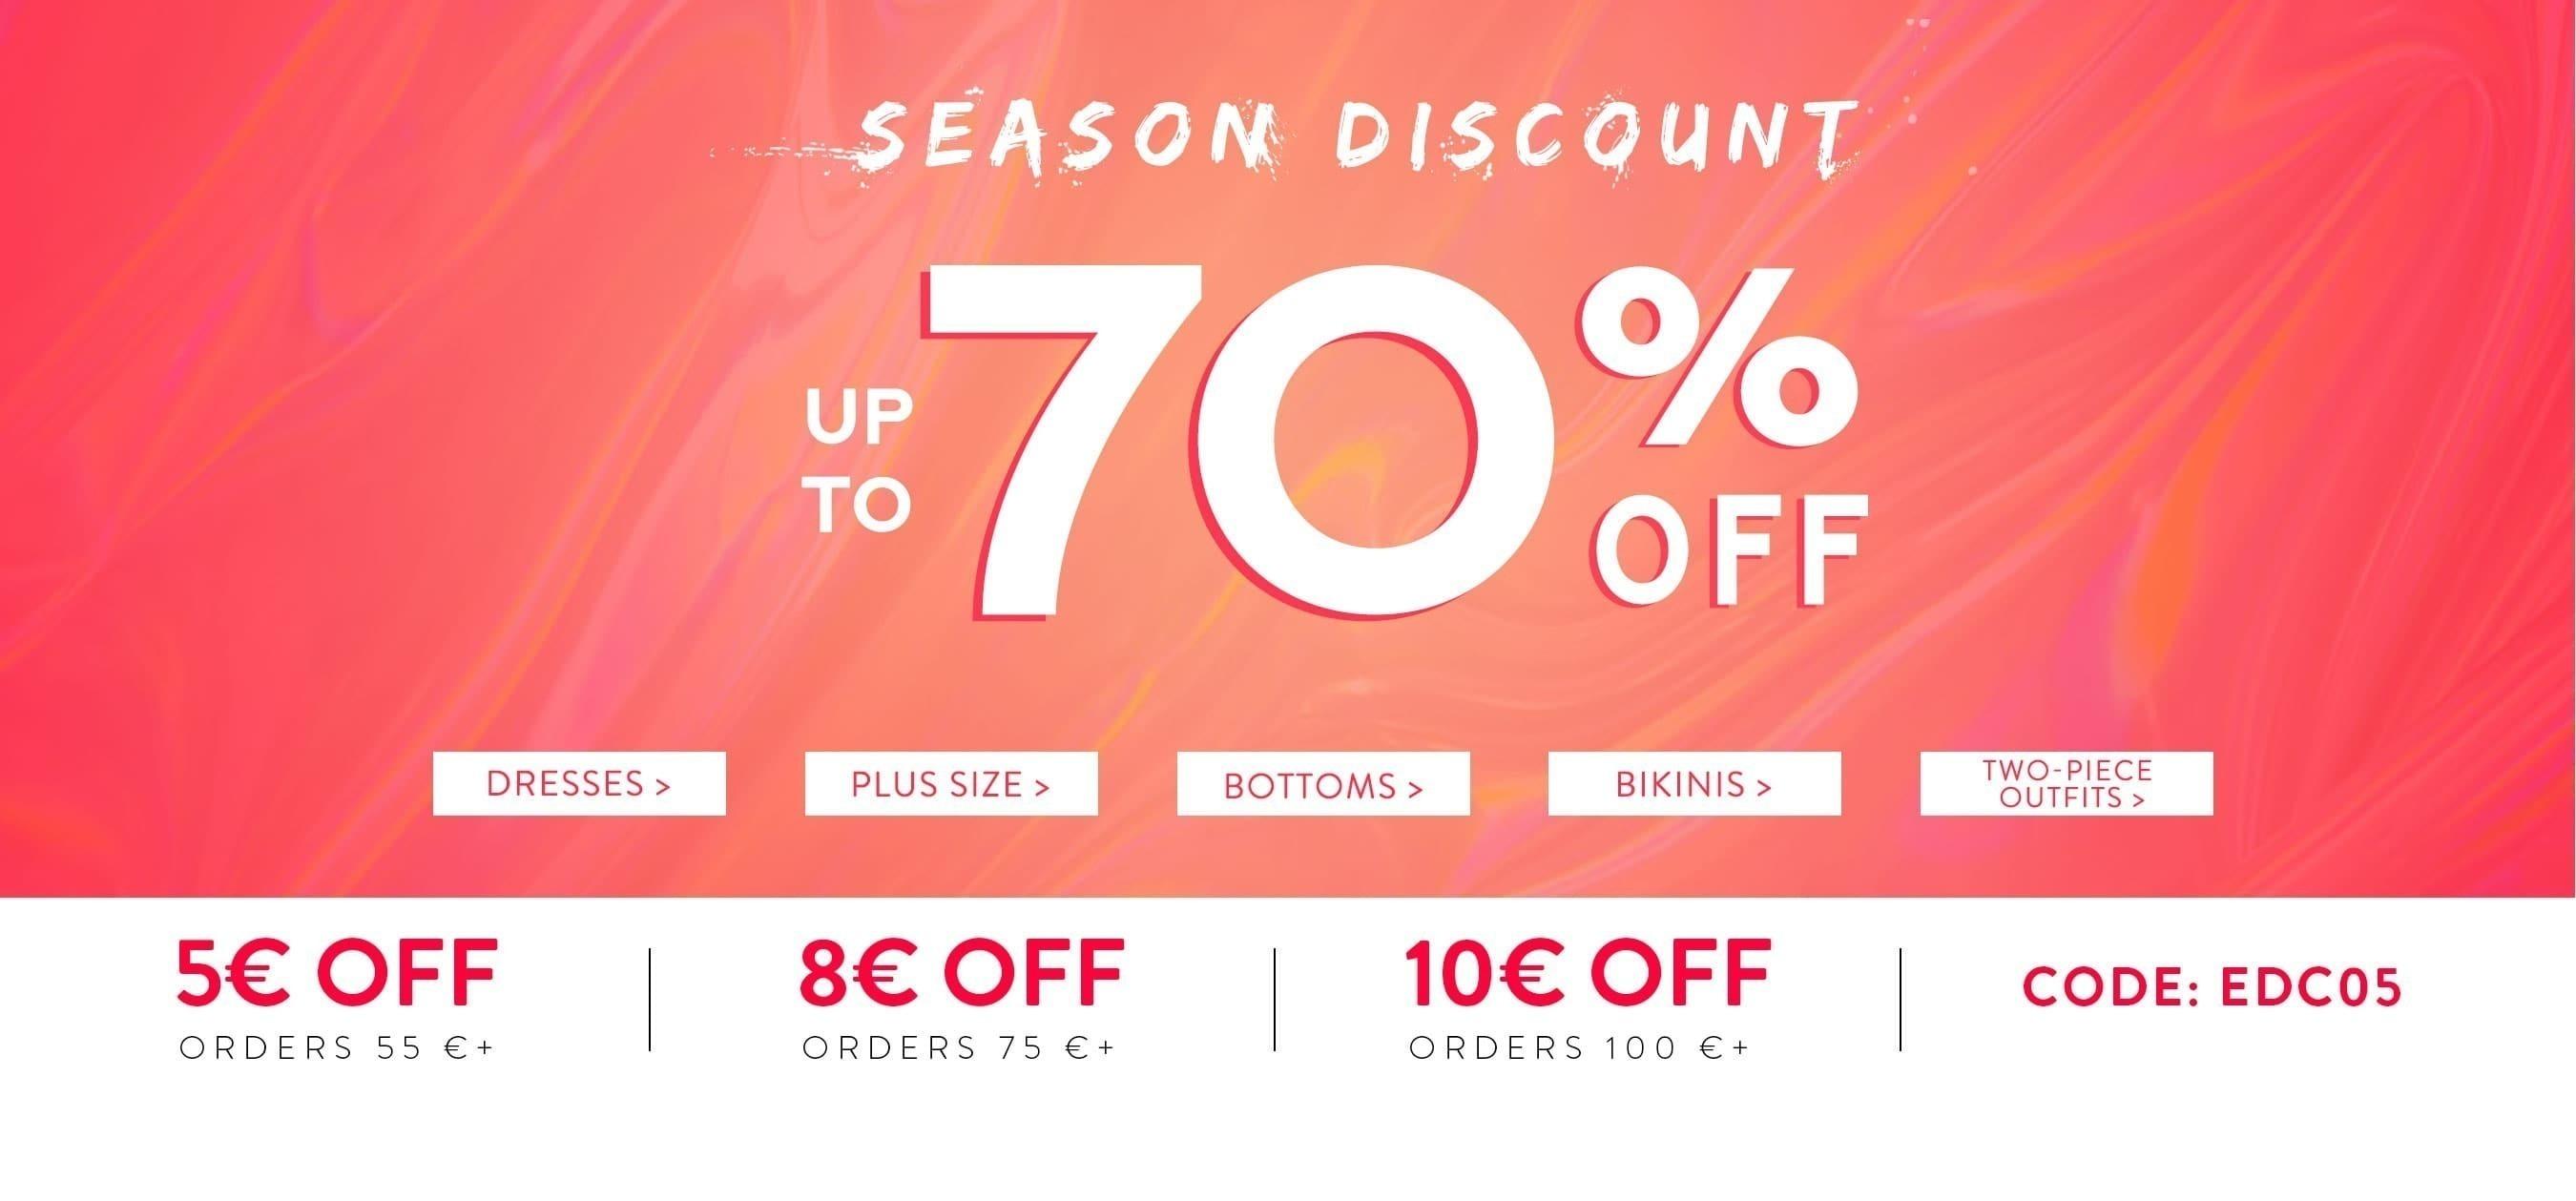 6ba2b2d894e0 SHEIN   Women's Clothing   Shop Clothes & Fashion